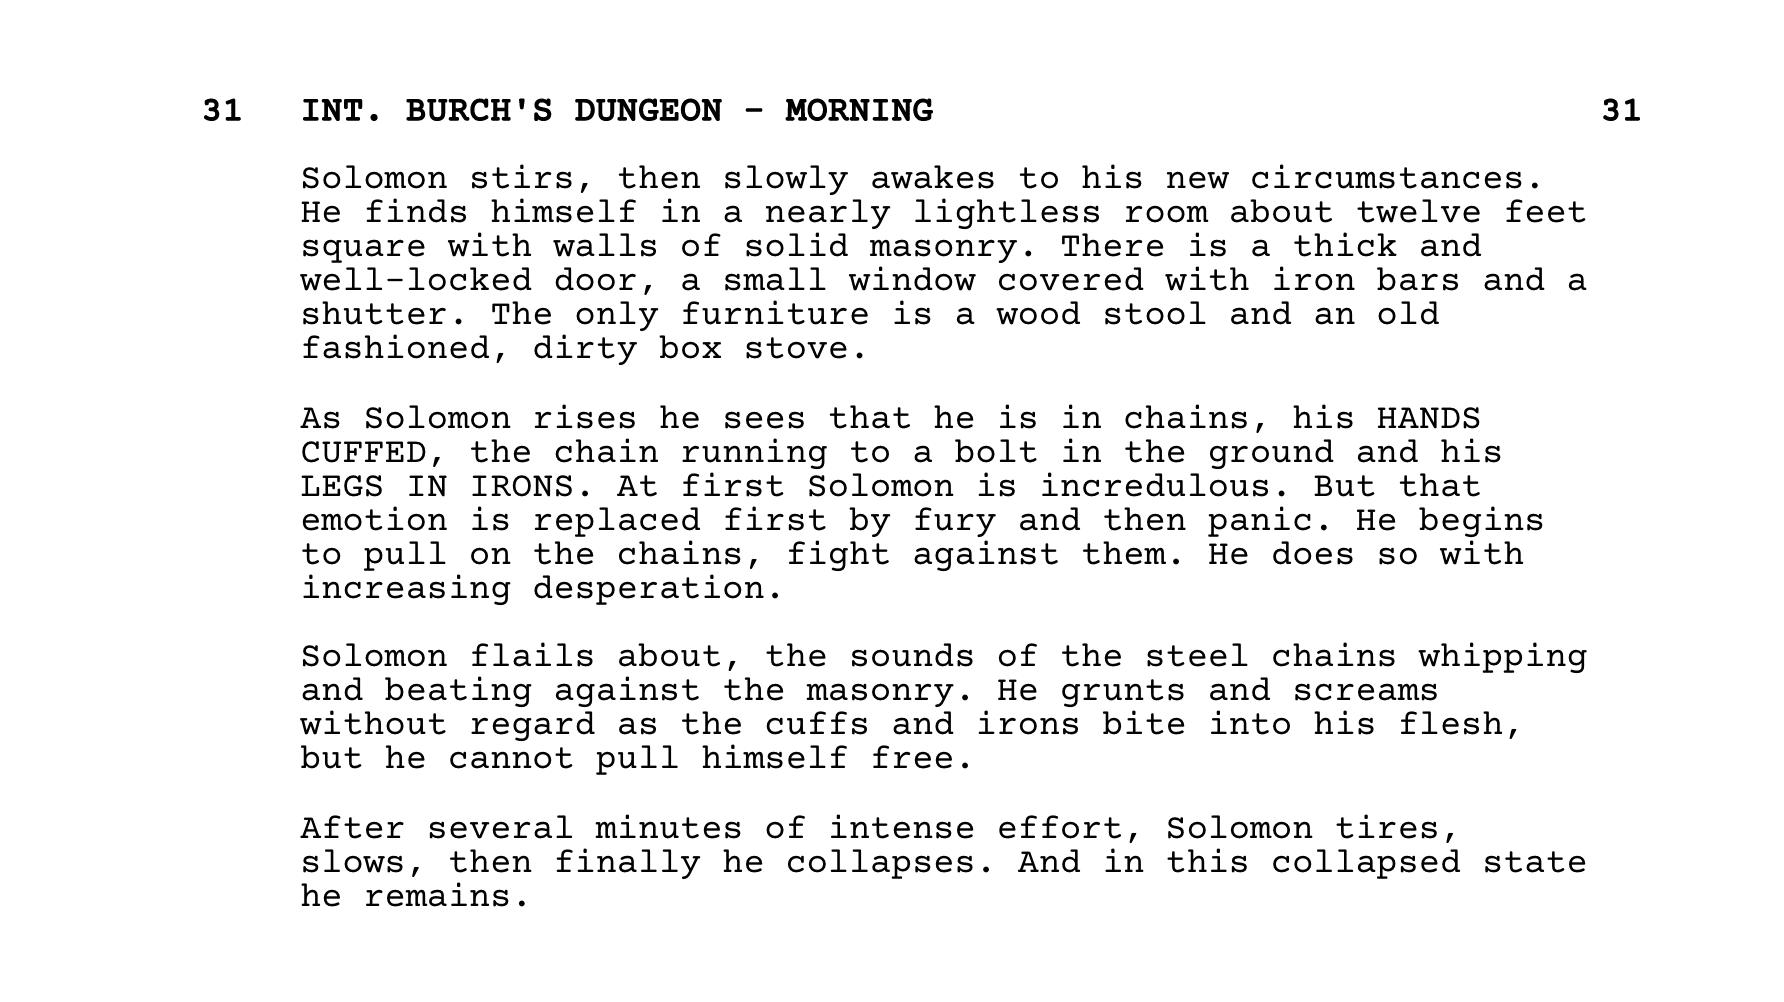 Best Adapted Screenplays - 12 Years a Slave - StudioBinder Screenwriting